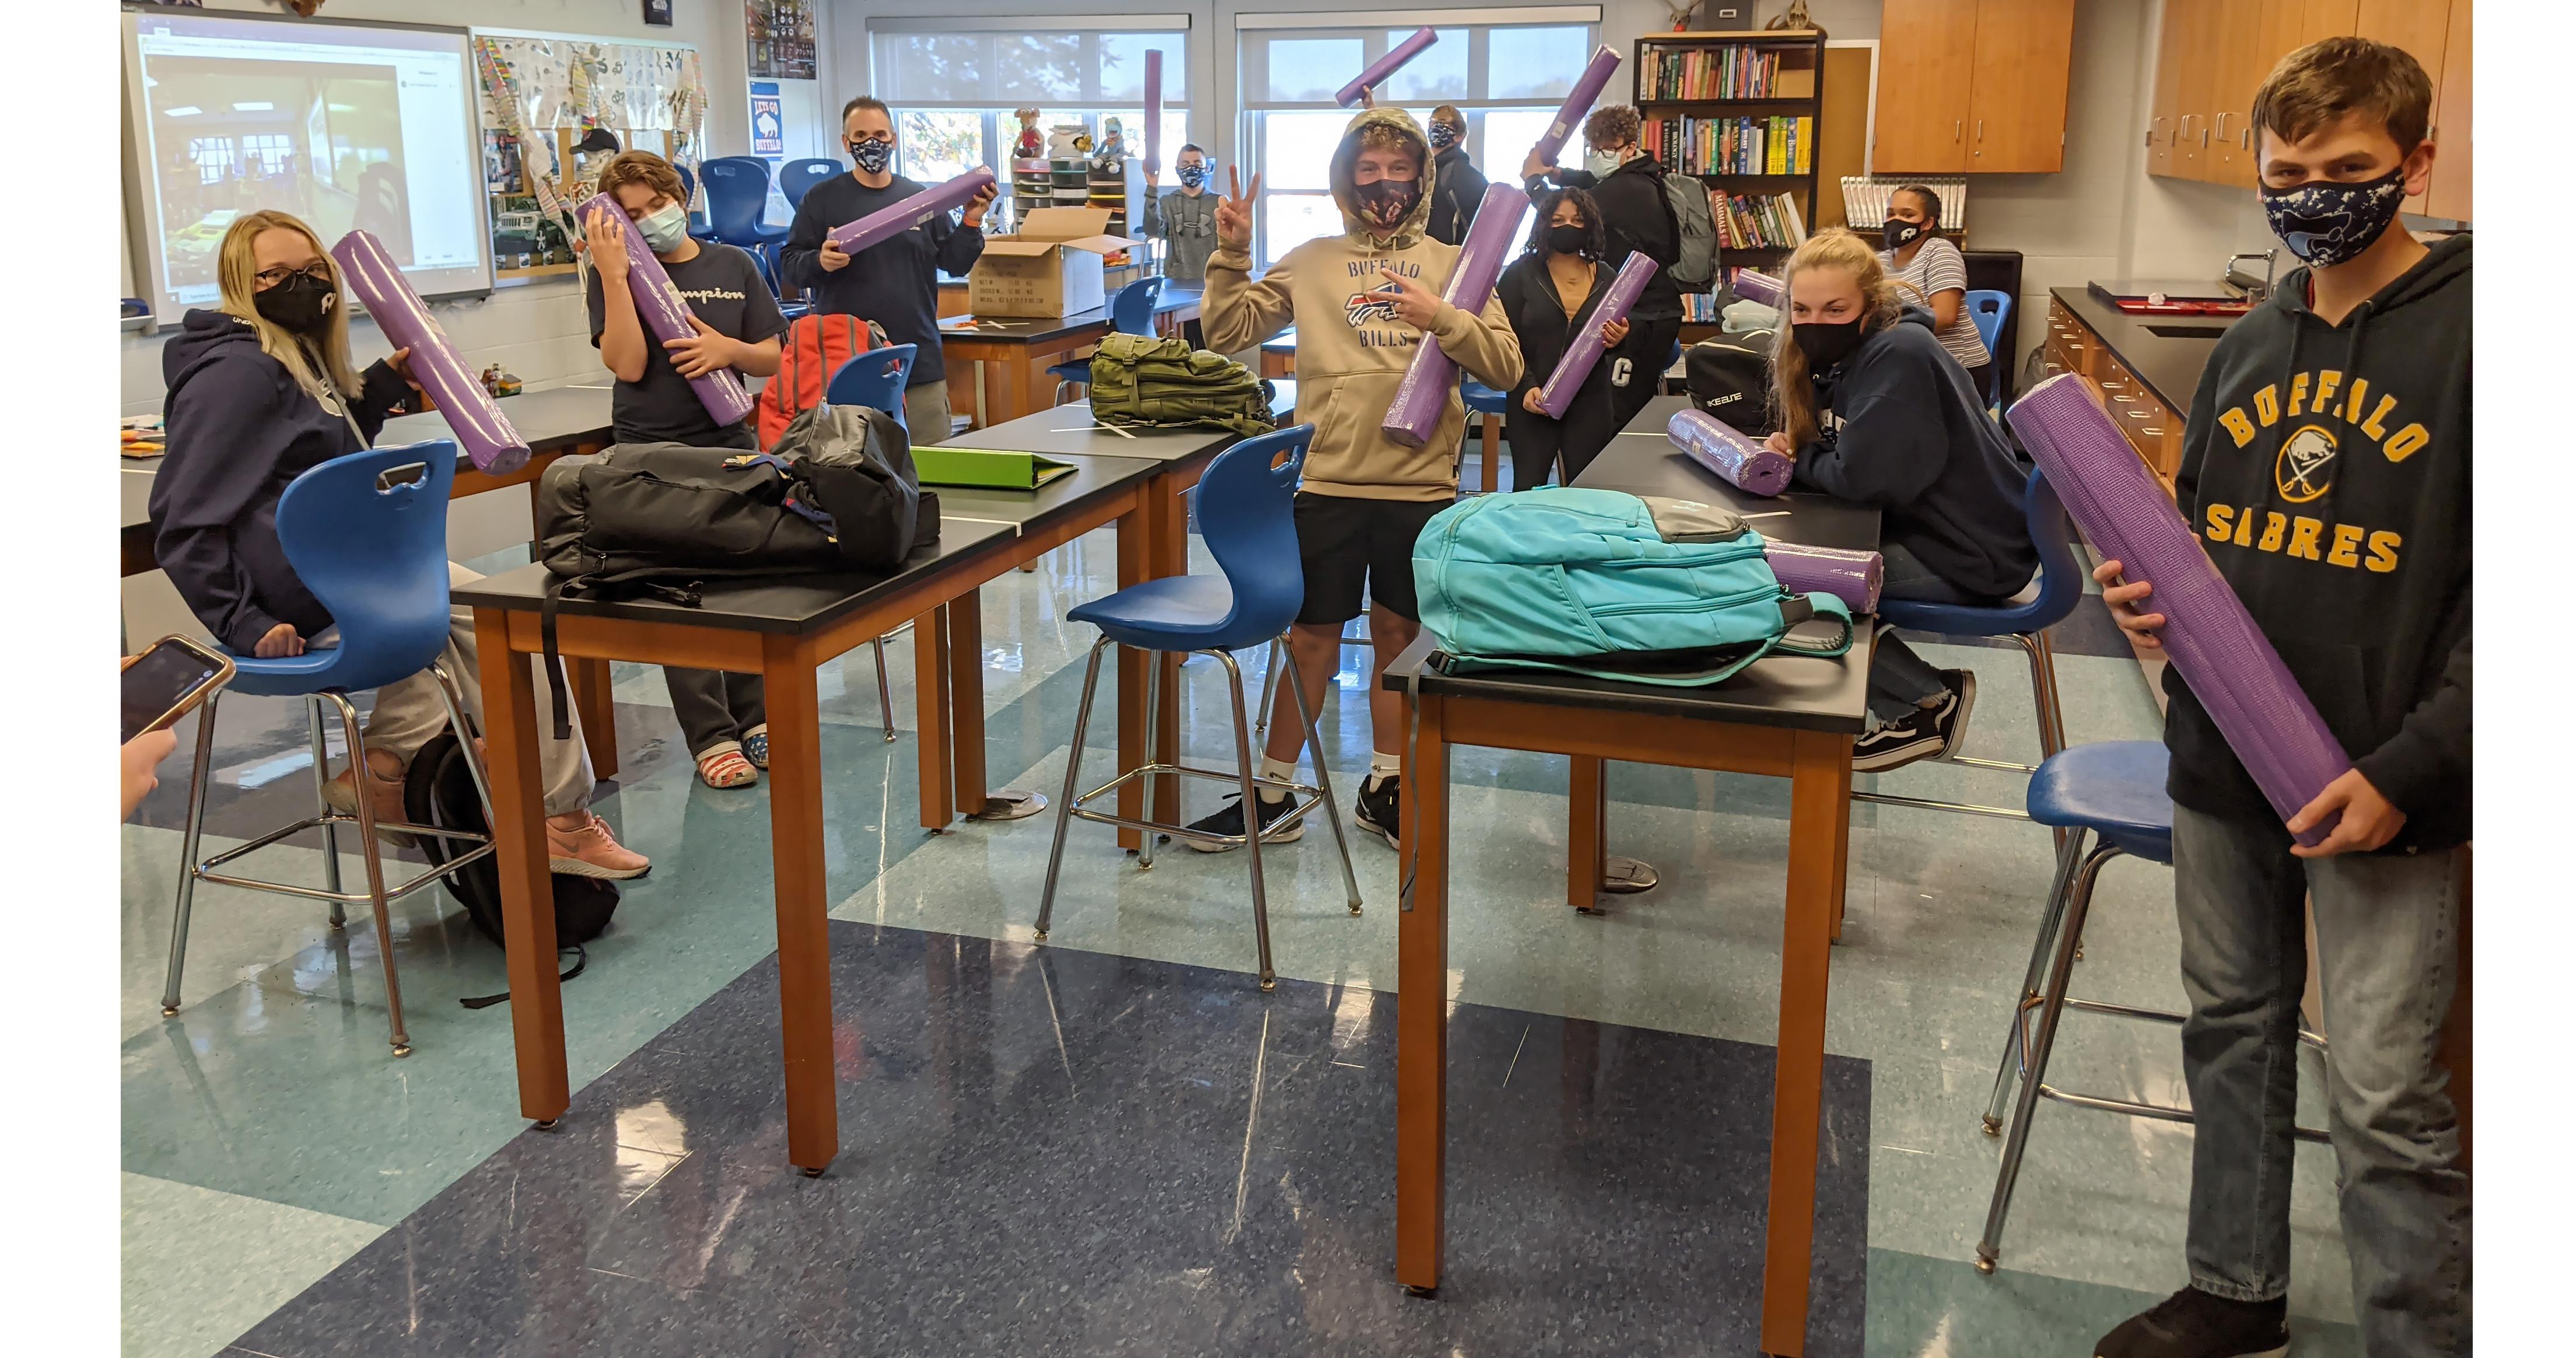 Yoga mat distribution in Mr. Grzybek's class.